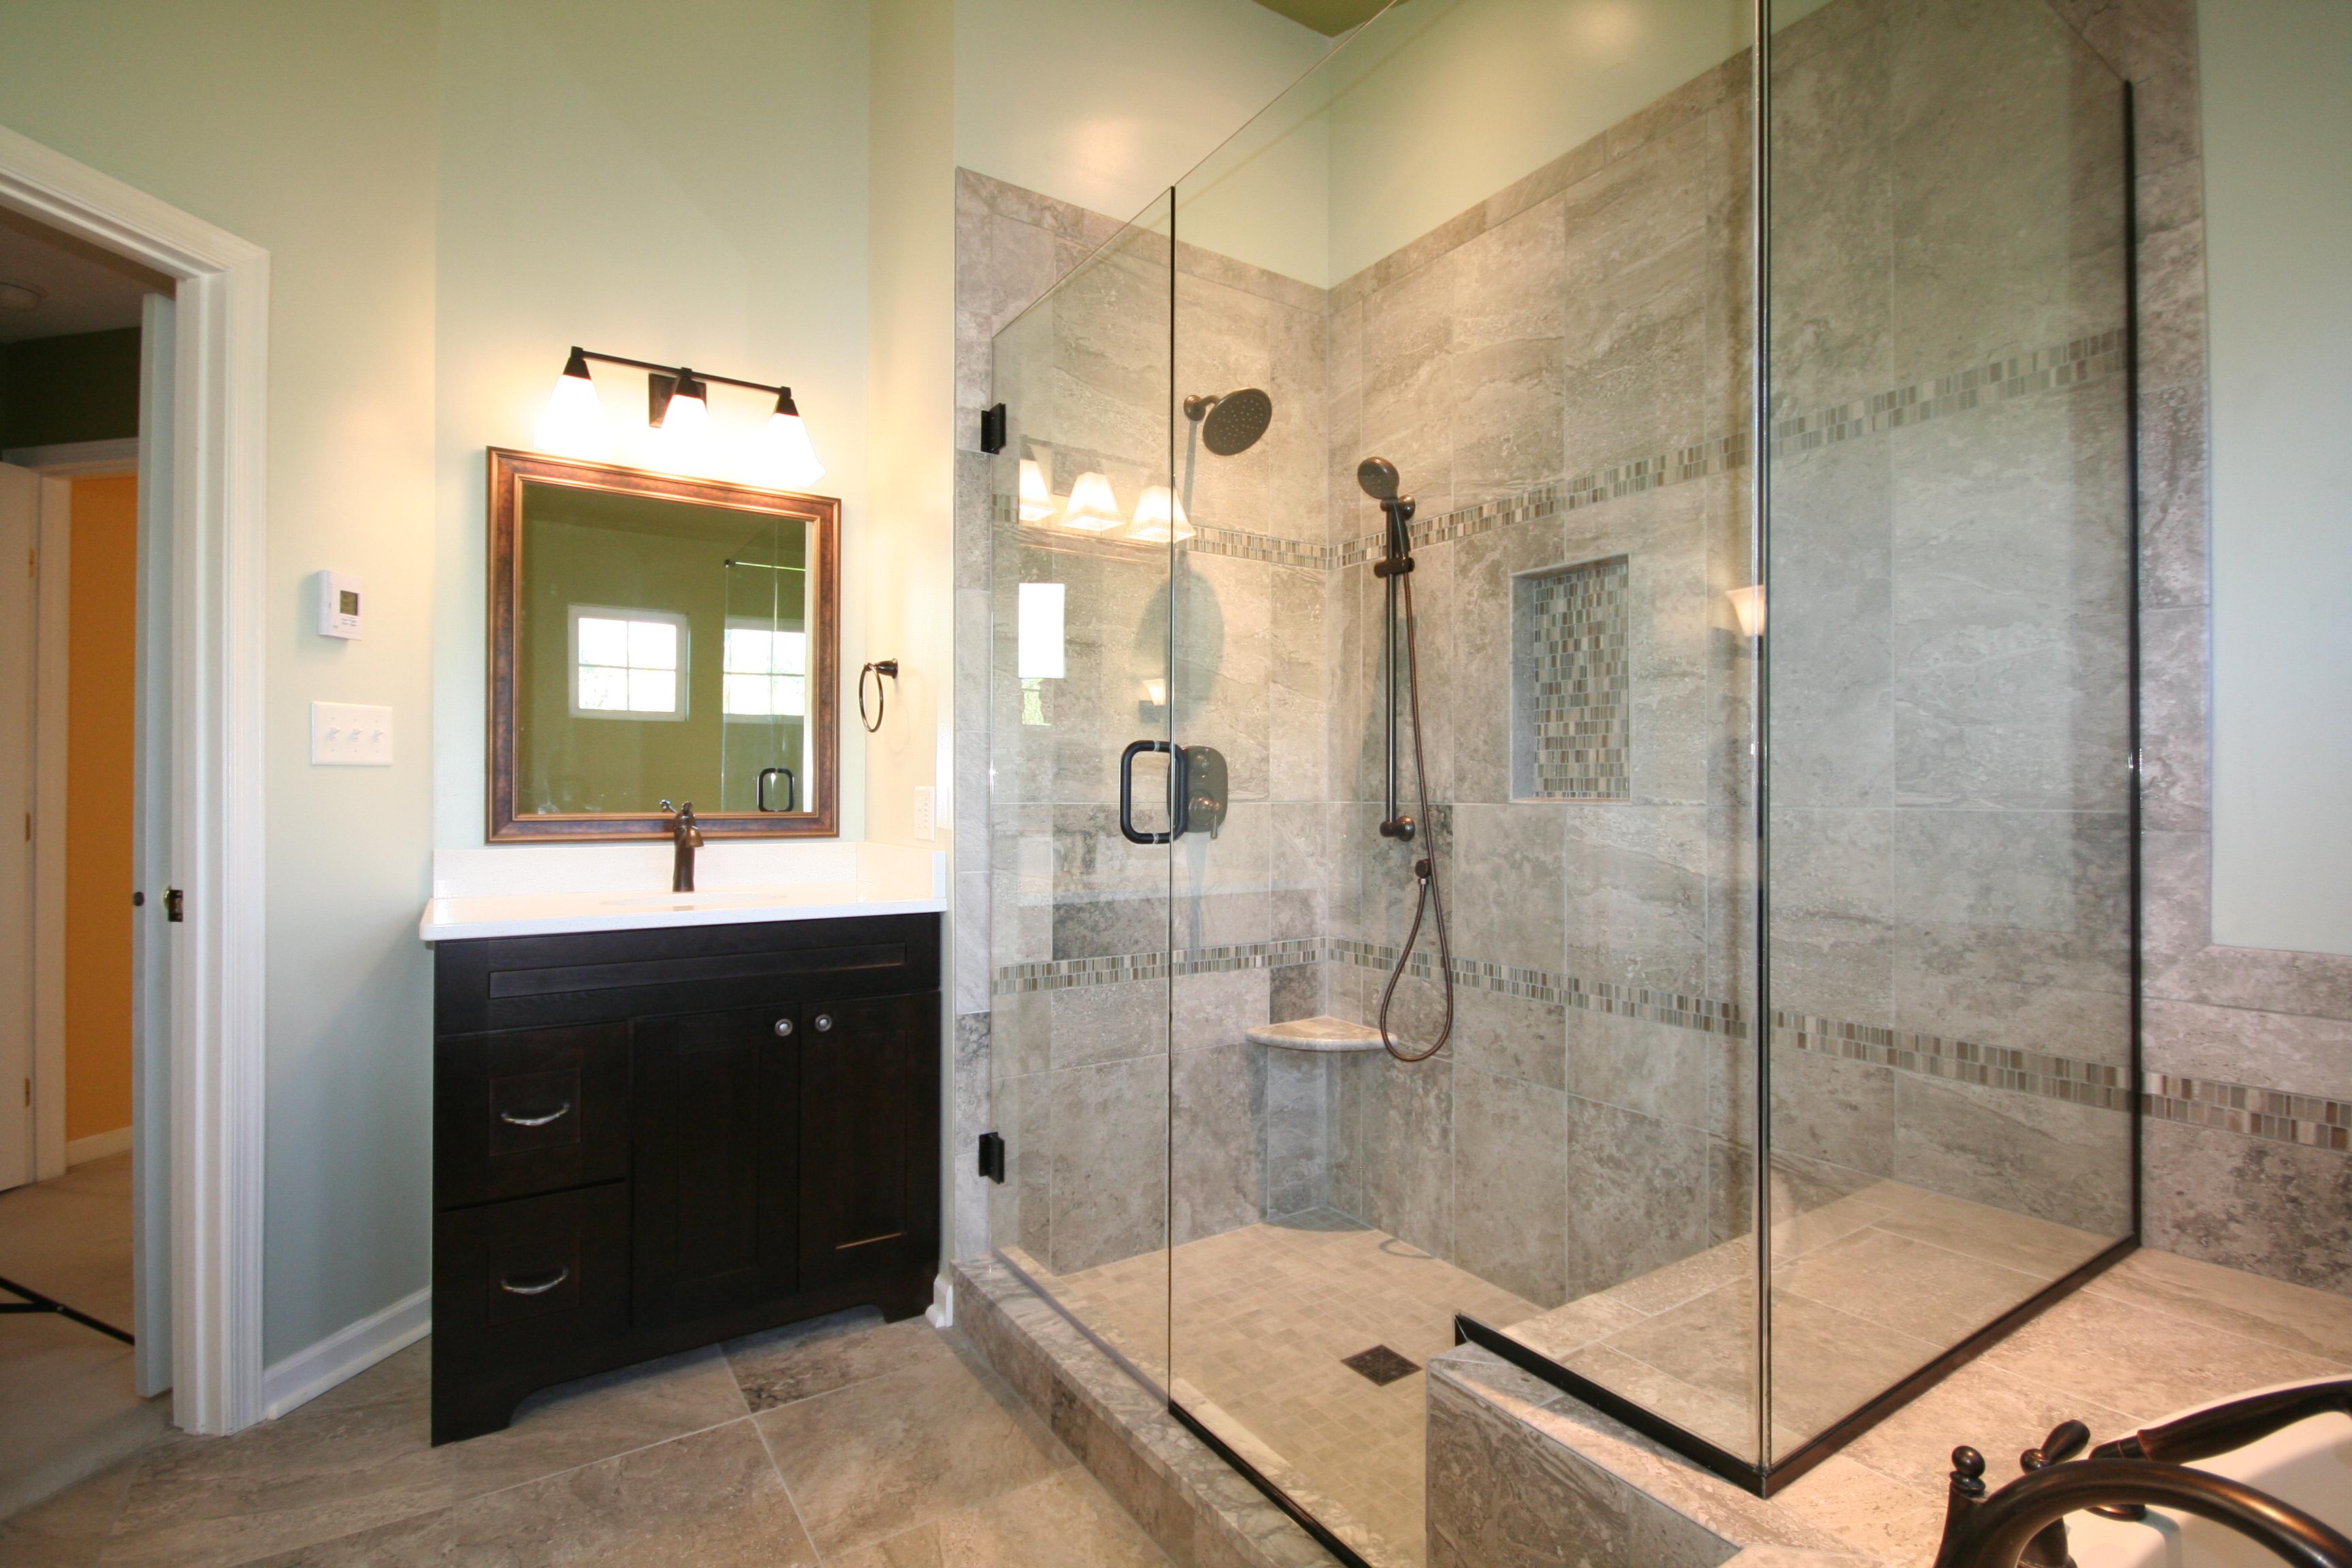 Bathroom Designs Lebanon beautiful bathroom designs lebanon lcd deep tile interior design